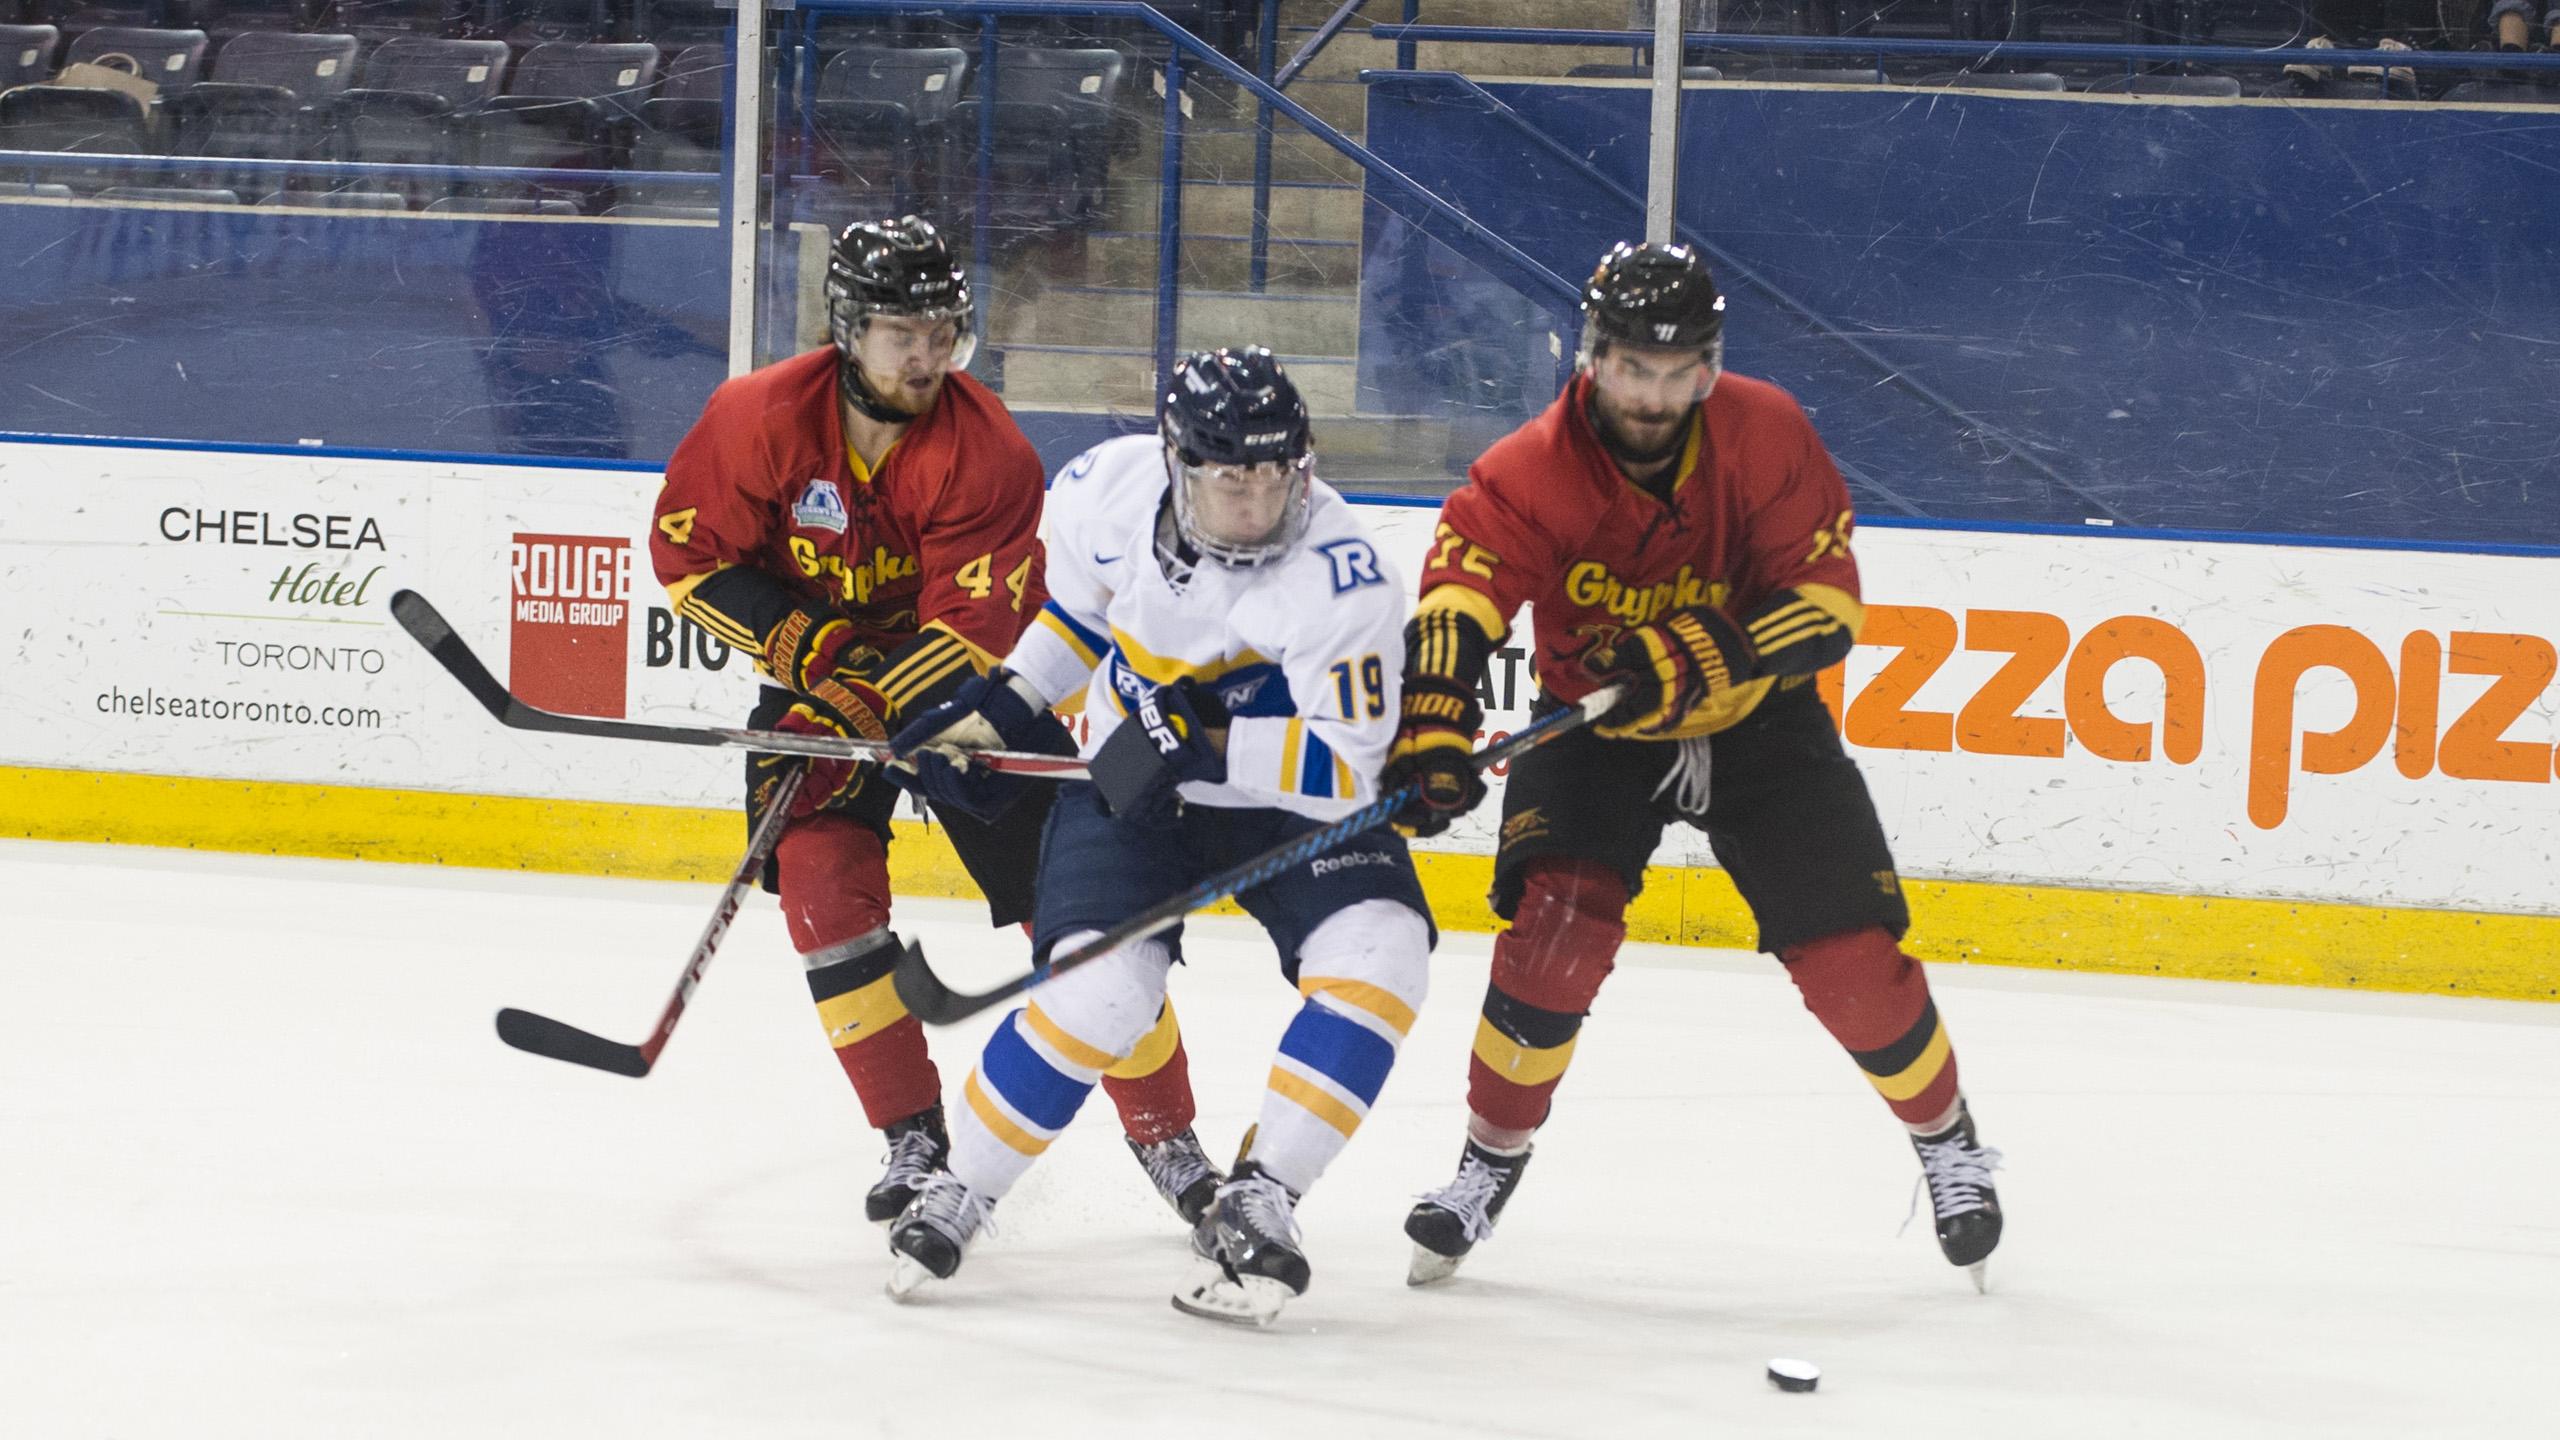 MensHockey5_Feb7_AndrejIvanov